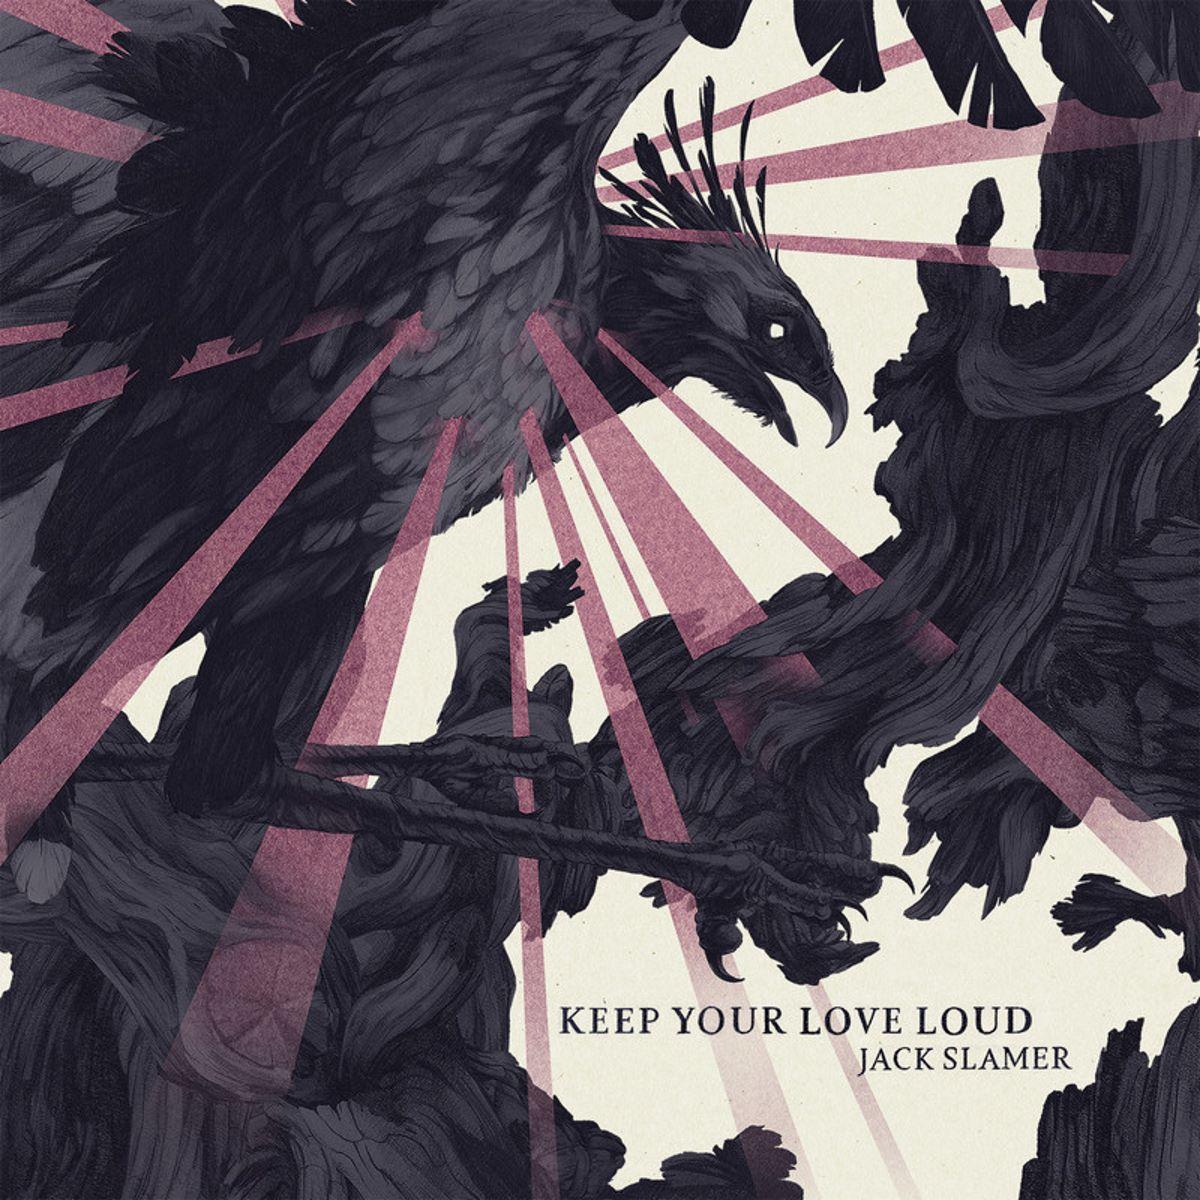 jack slamer - keep your love loud - album cover